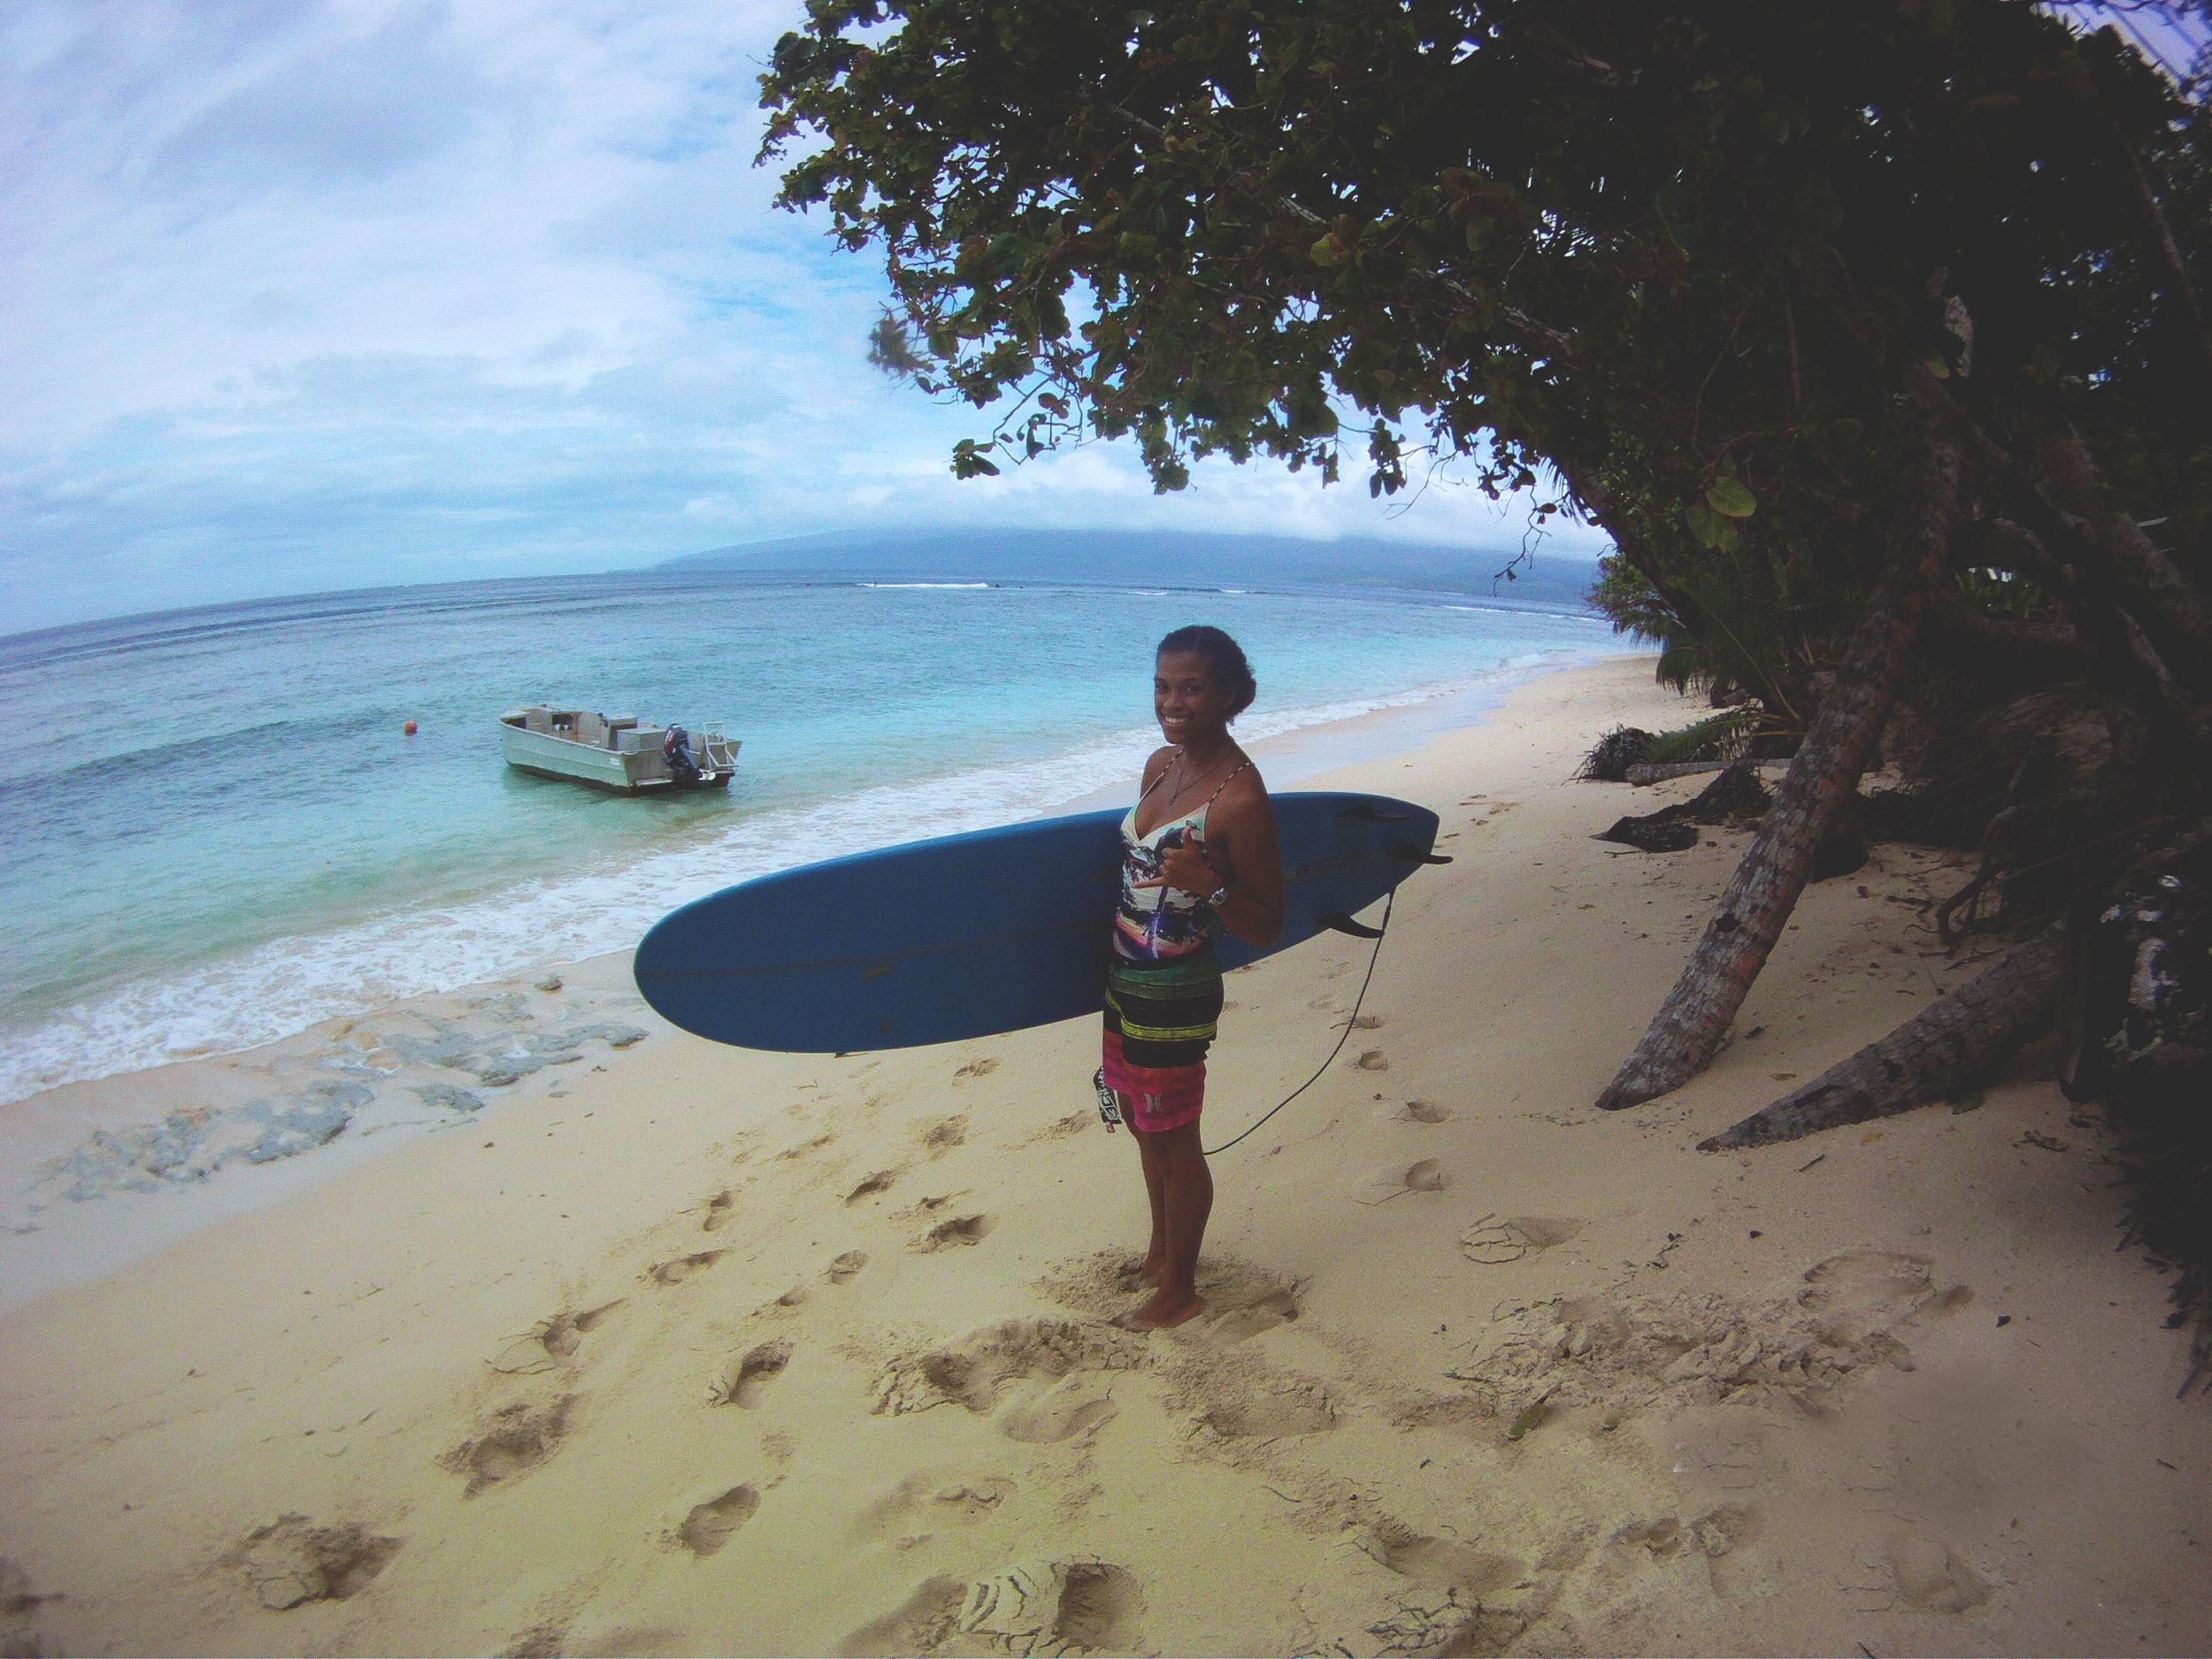 Alise heading to surf